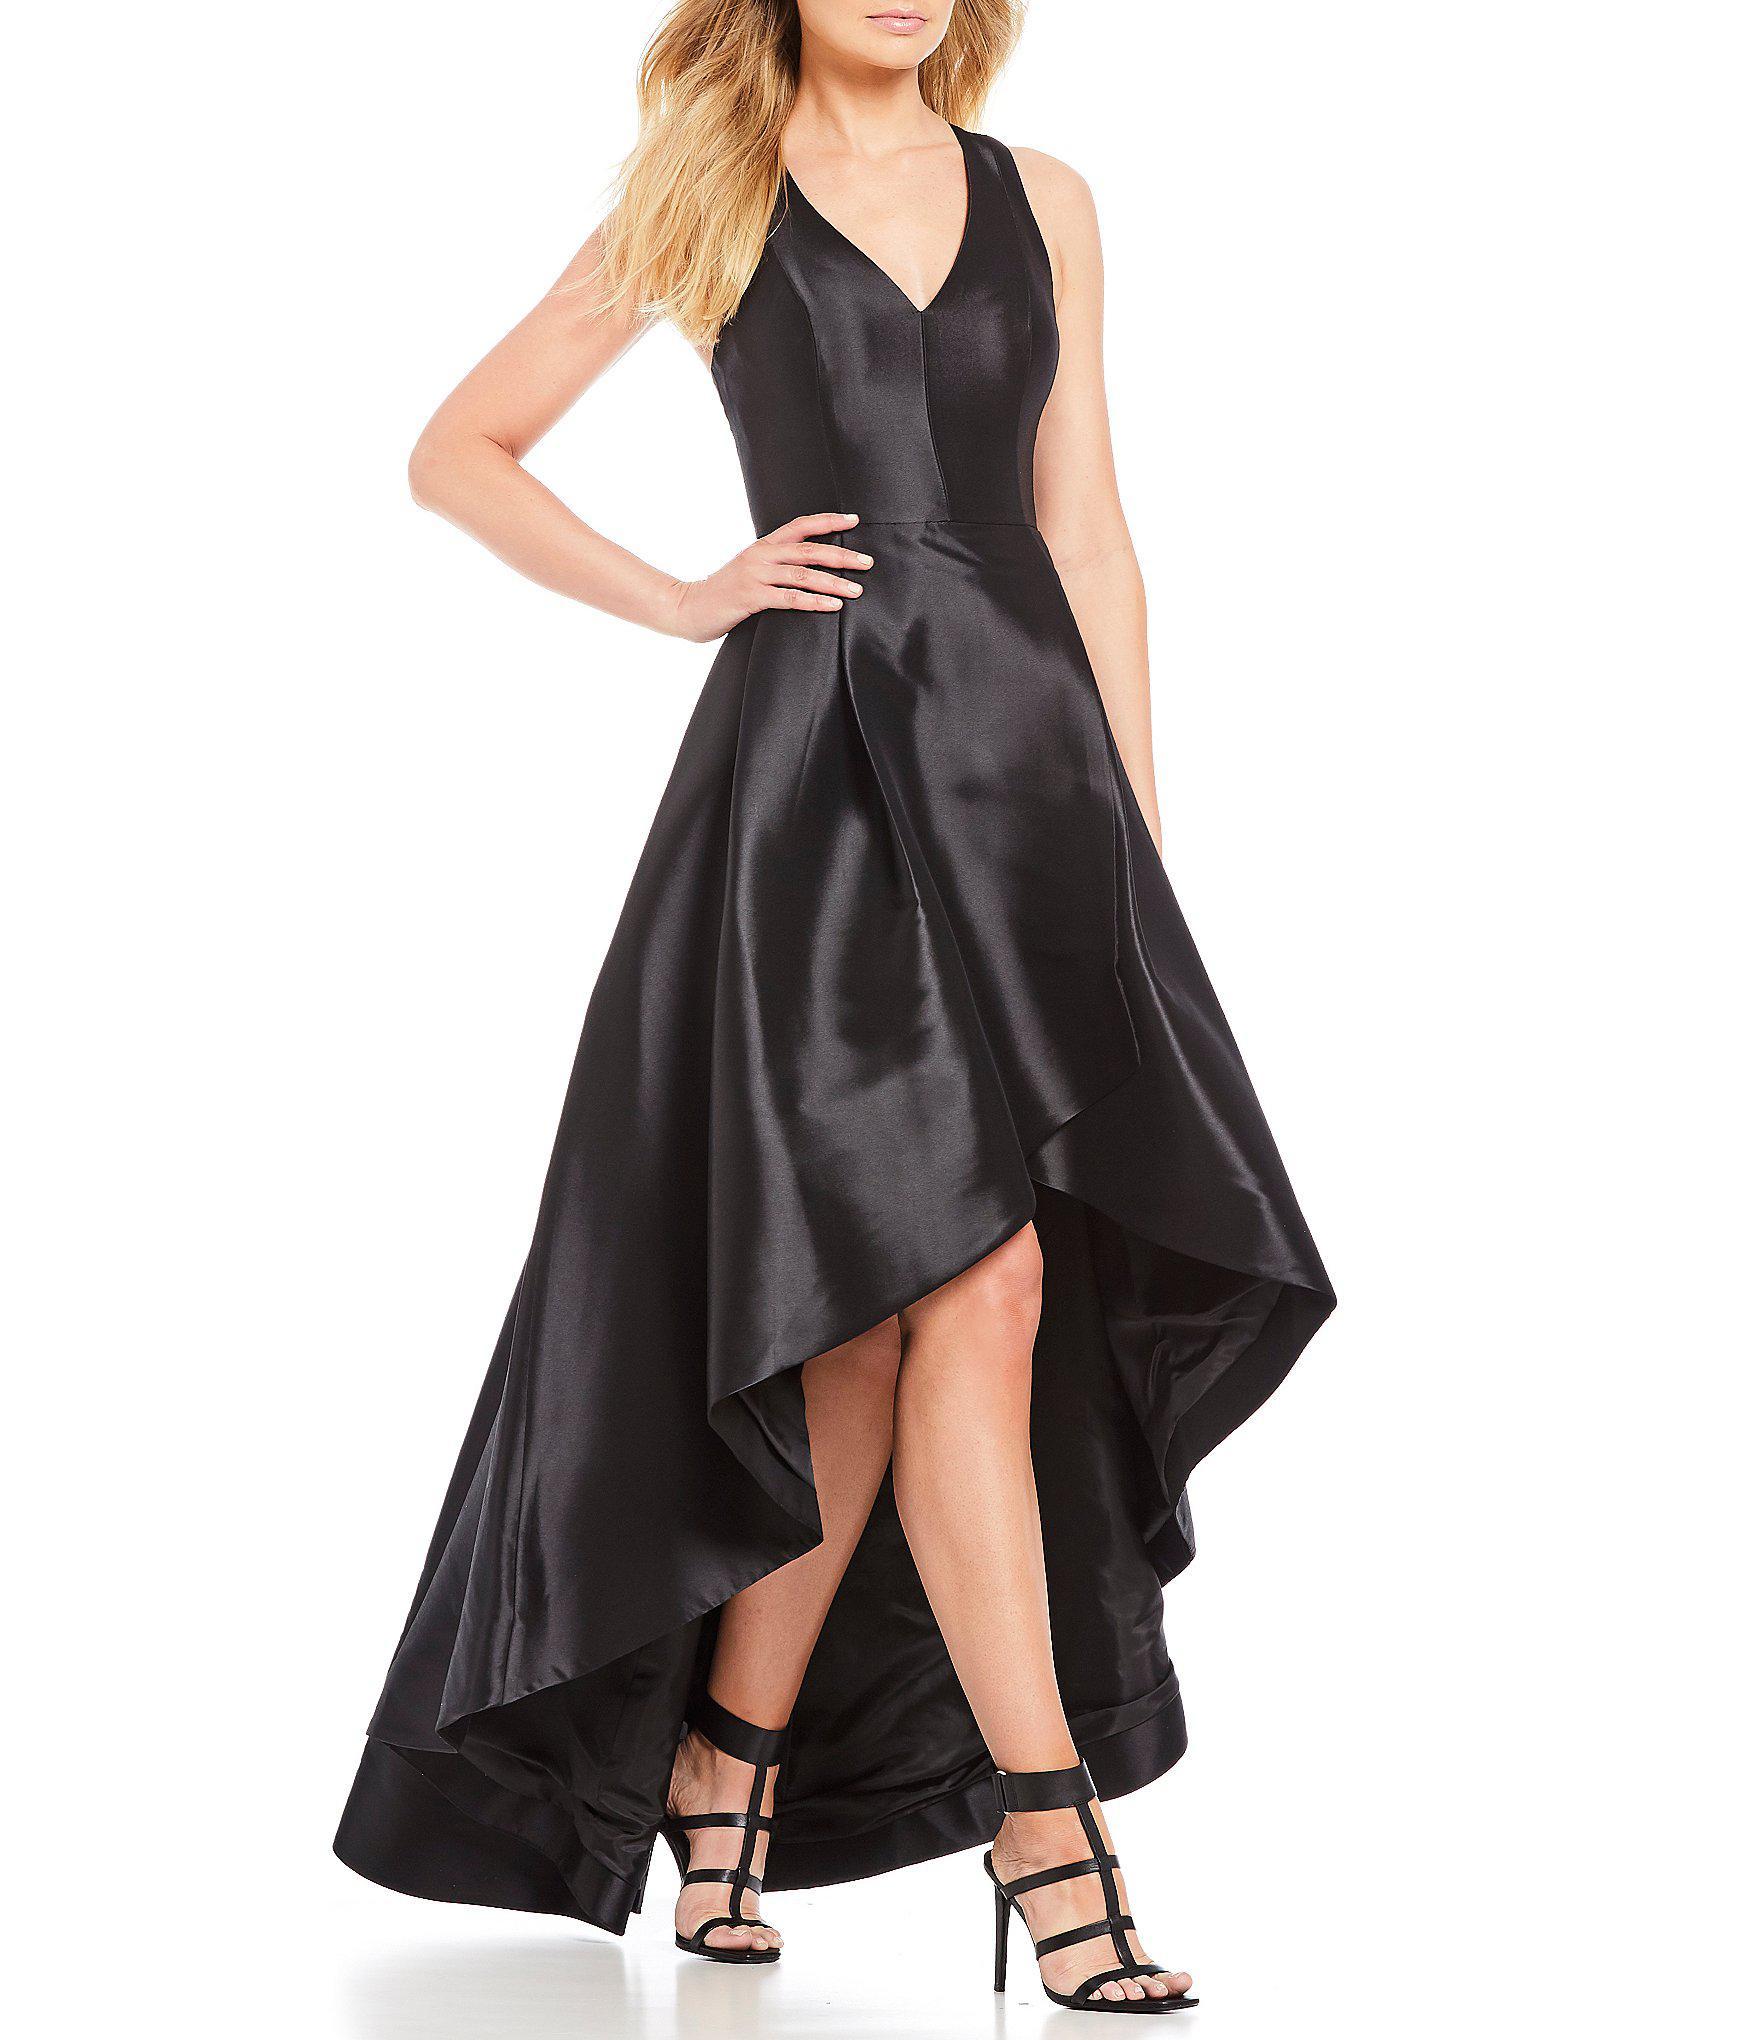 f2ba1faa1eec Calvin Klein Taffeta Tulip Hi-low Dress in Black - Lyst